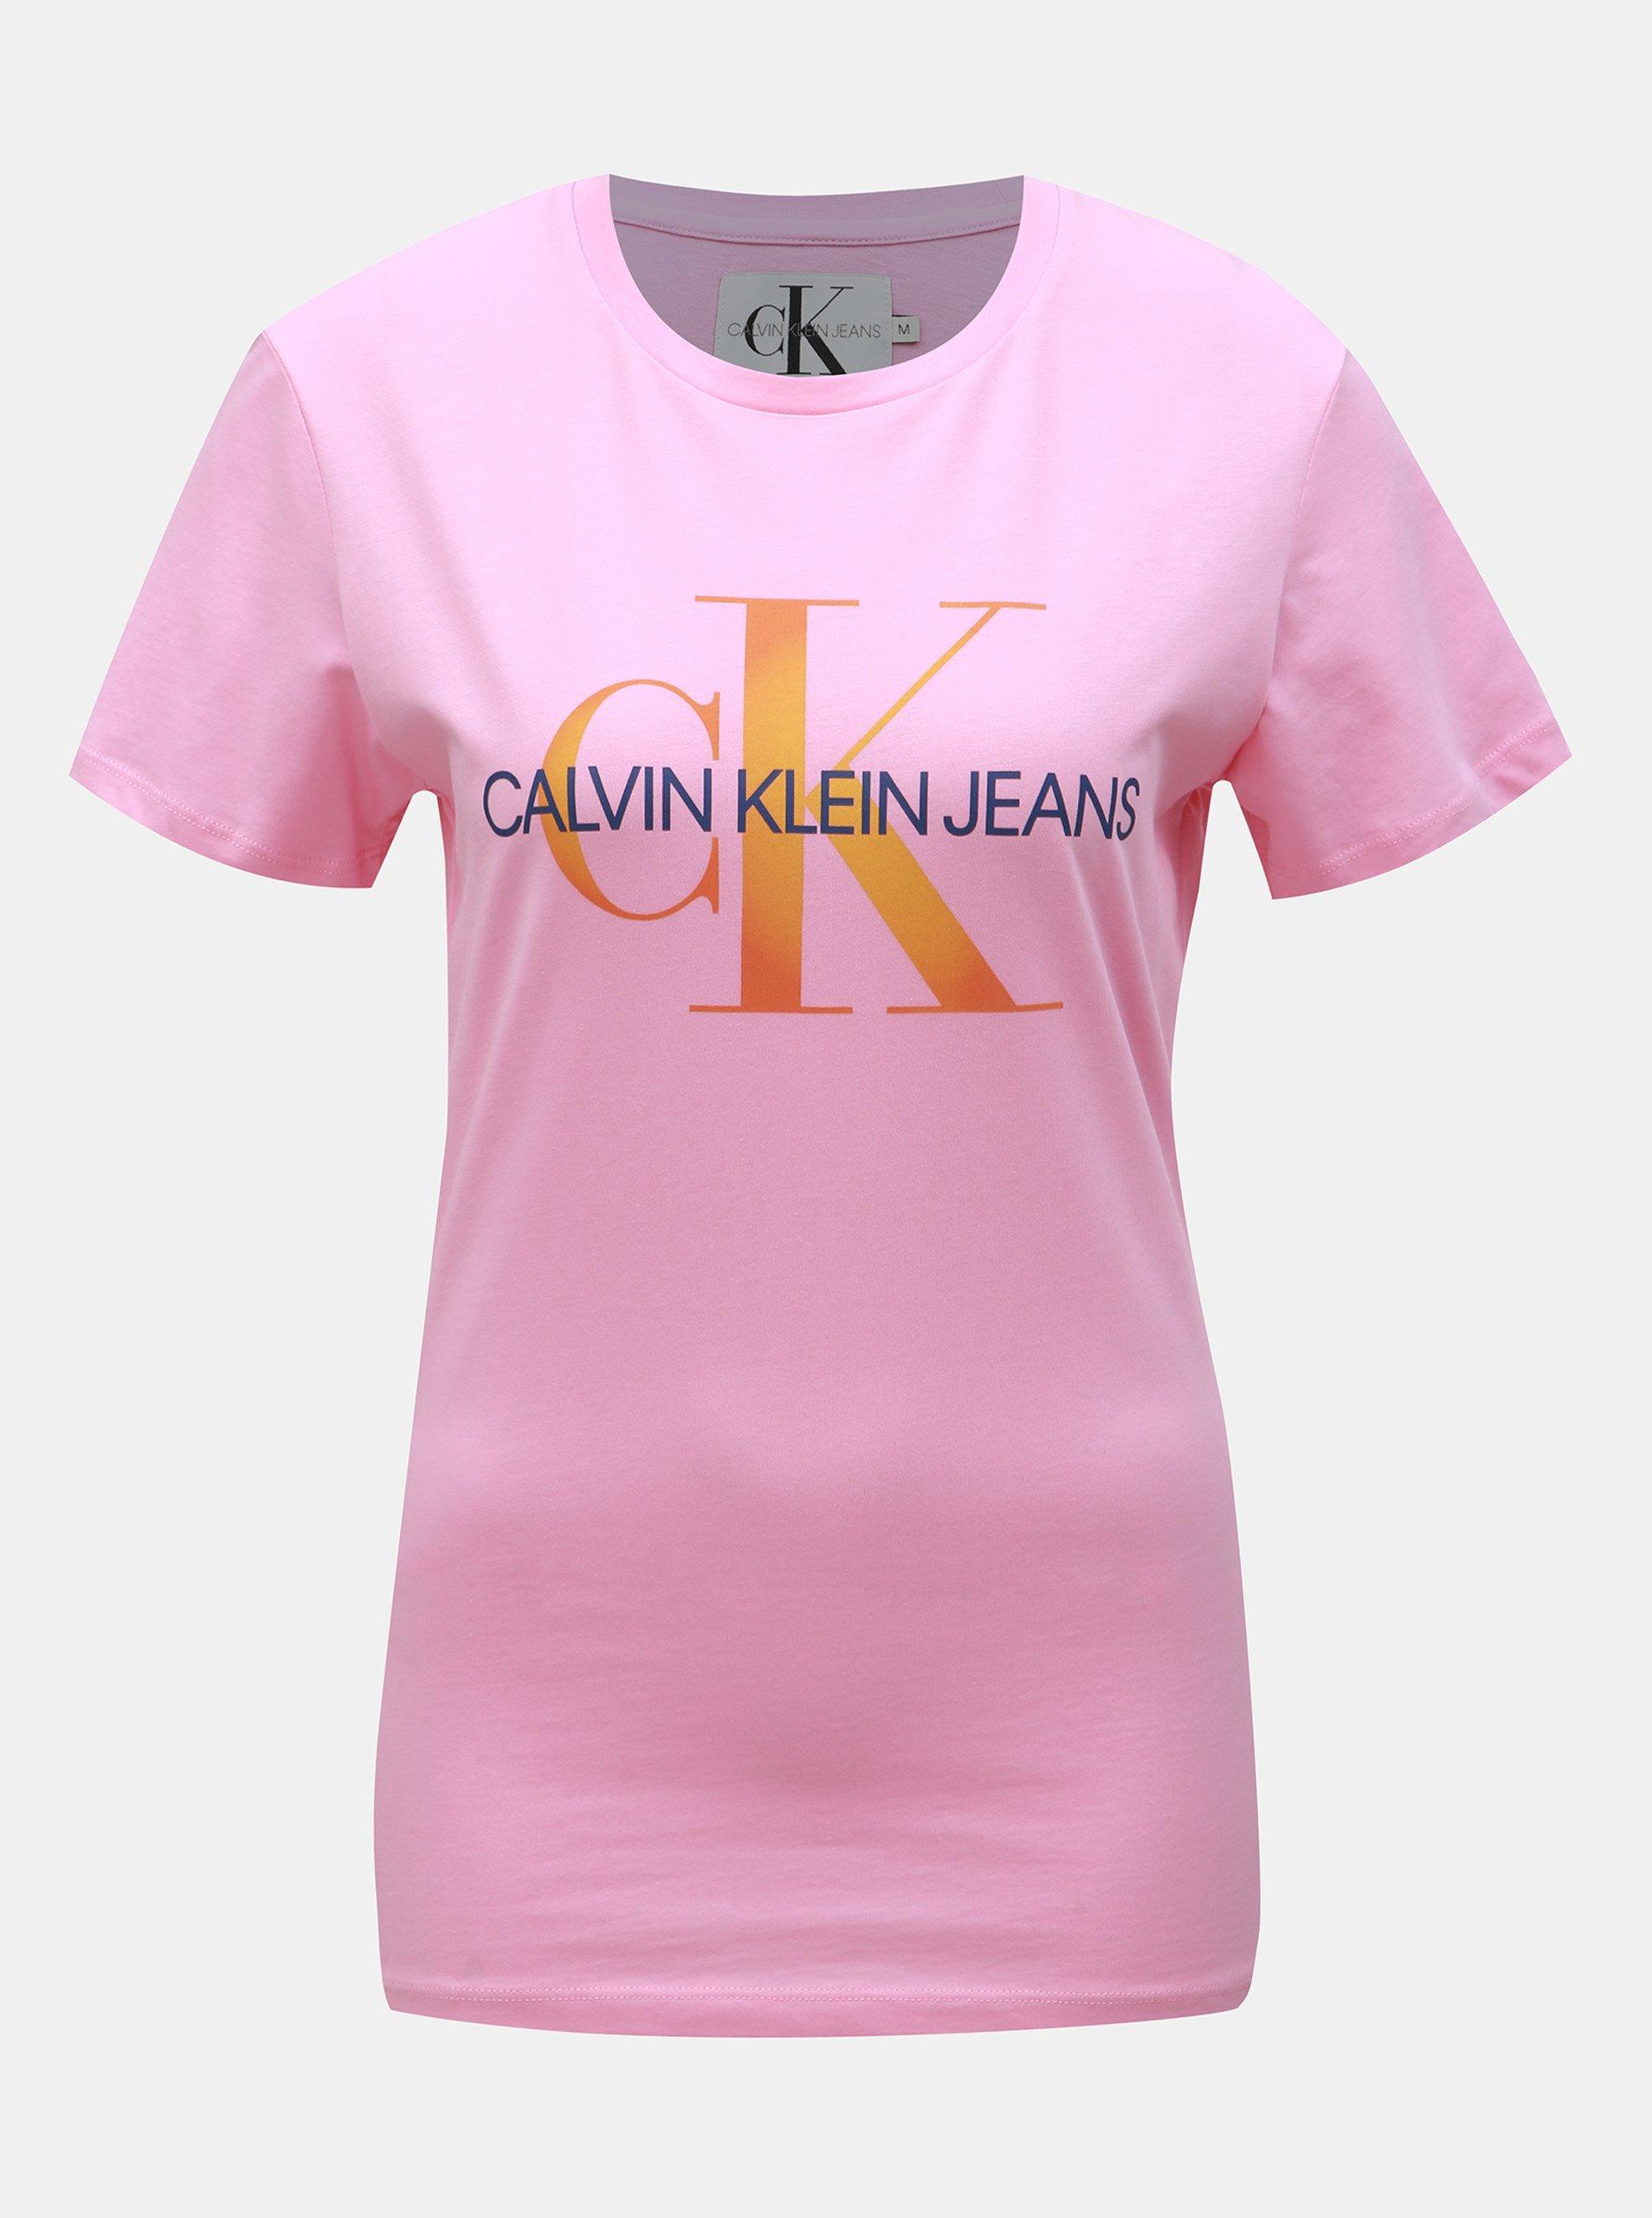 3fb460846 Růžové dámské tričko s potiskem Calvin Klein Jeans